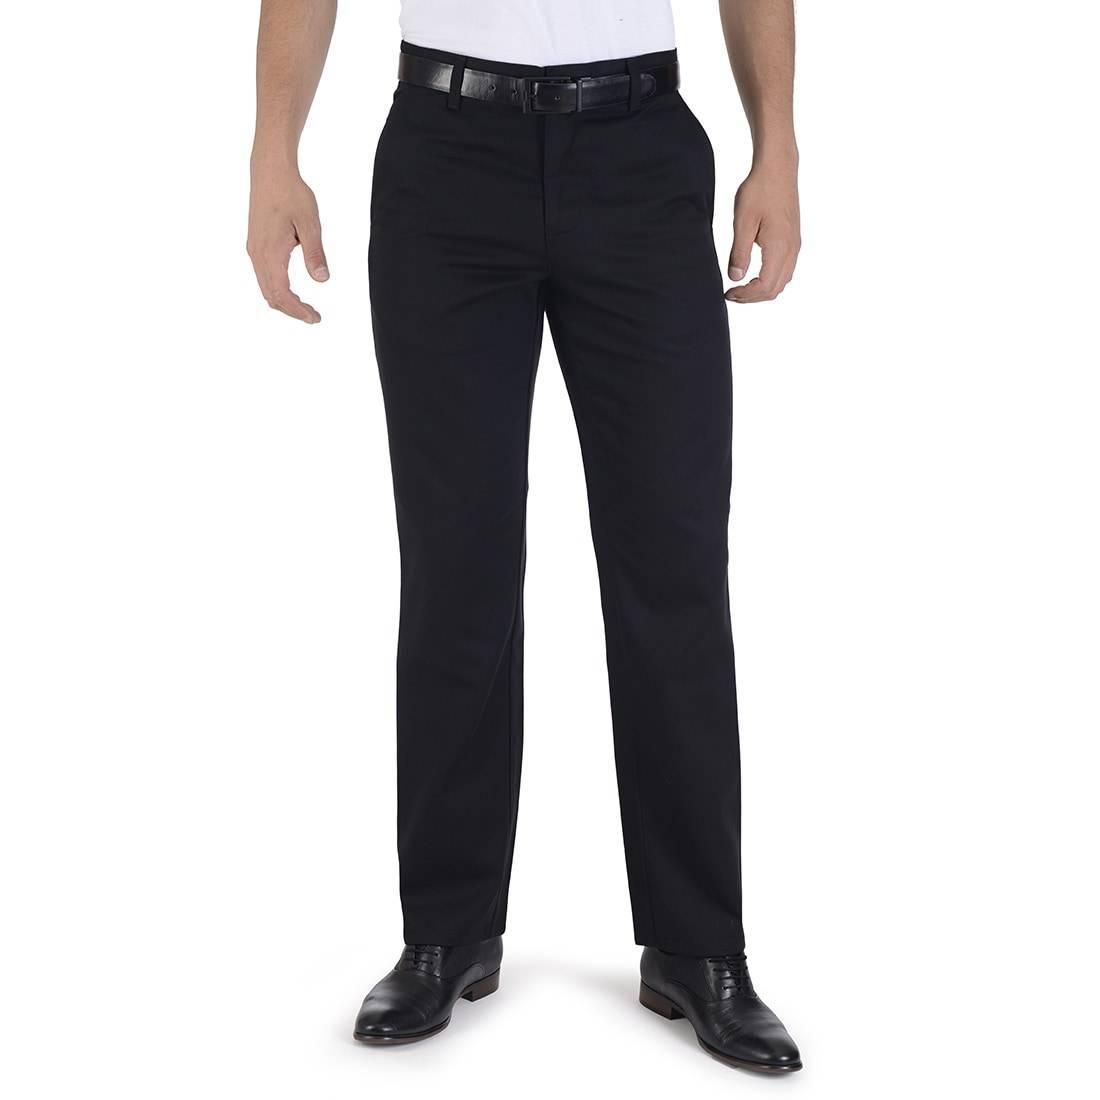 010789055209-01-Pantalon-Casual-Classic-Fit-Negro-yale